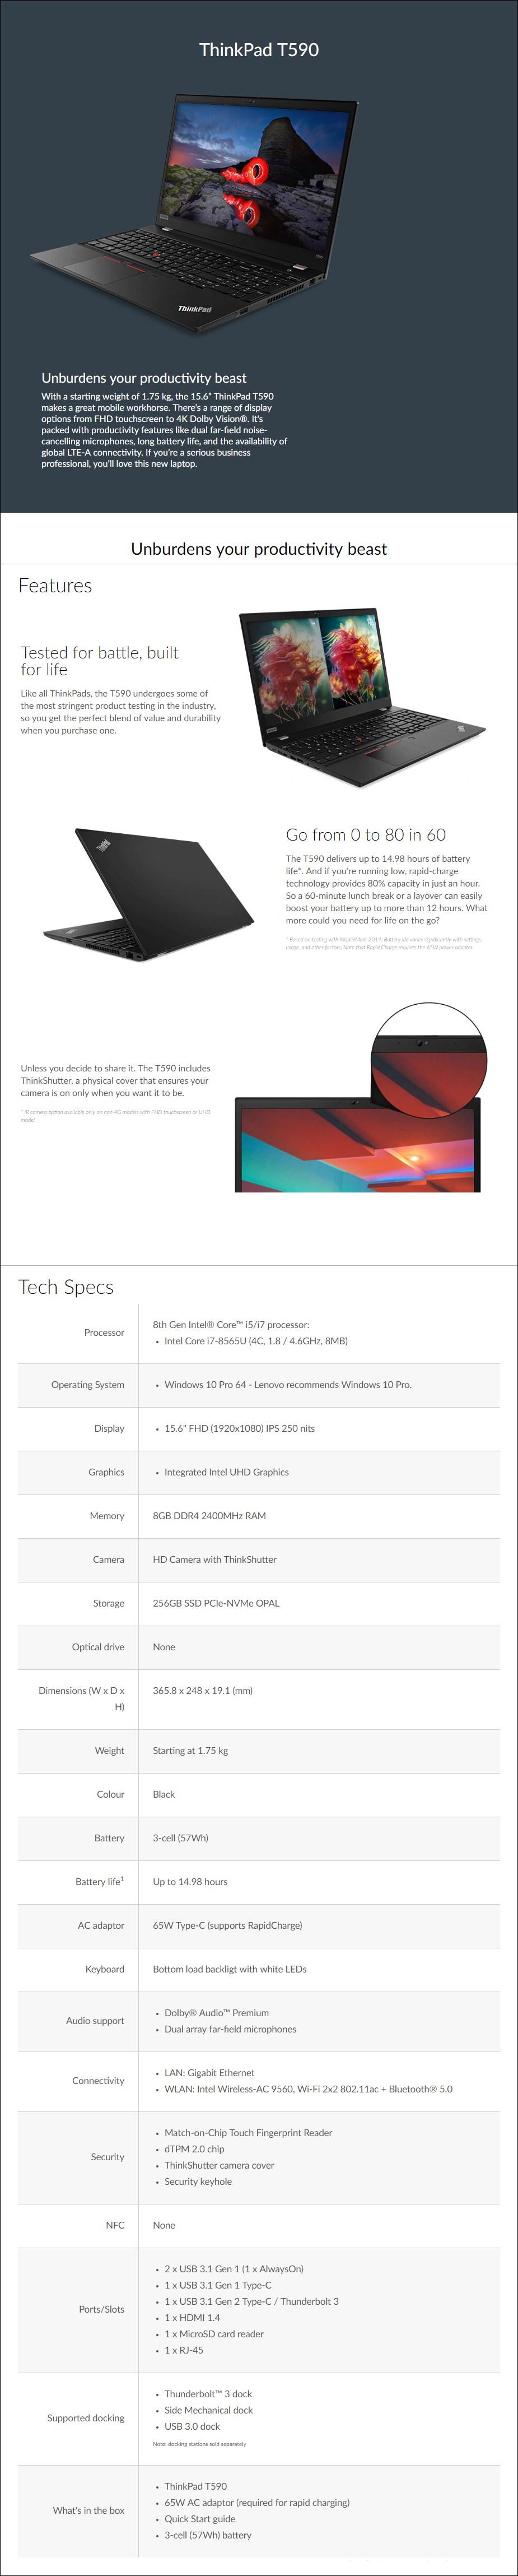 "Lenovo ThinkPad T590 15.6"" Laptop i7-8565U 8GB 256GB SSD W10P - Overview 1"